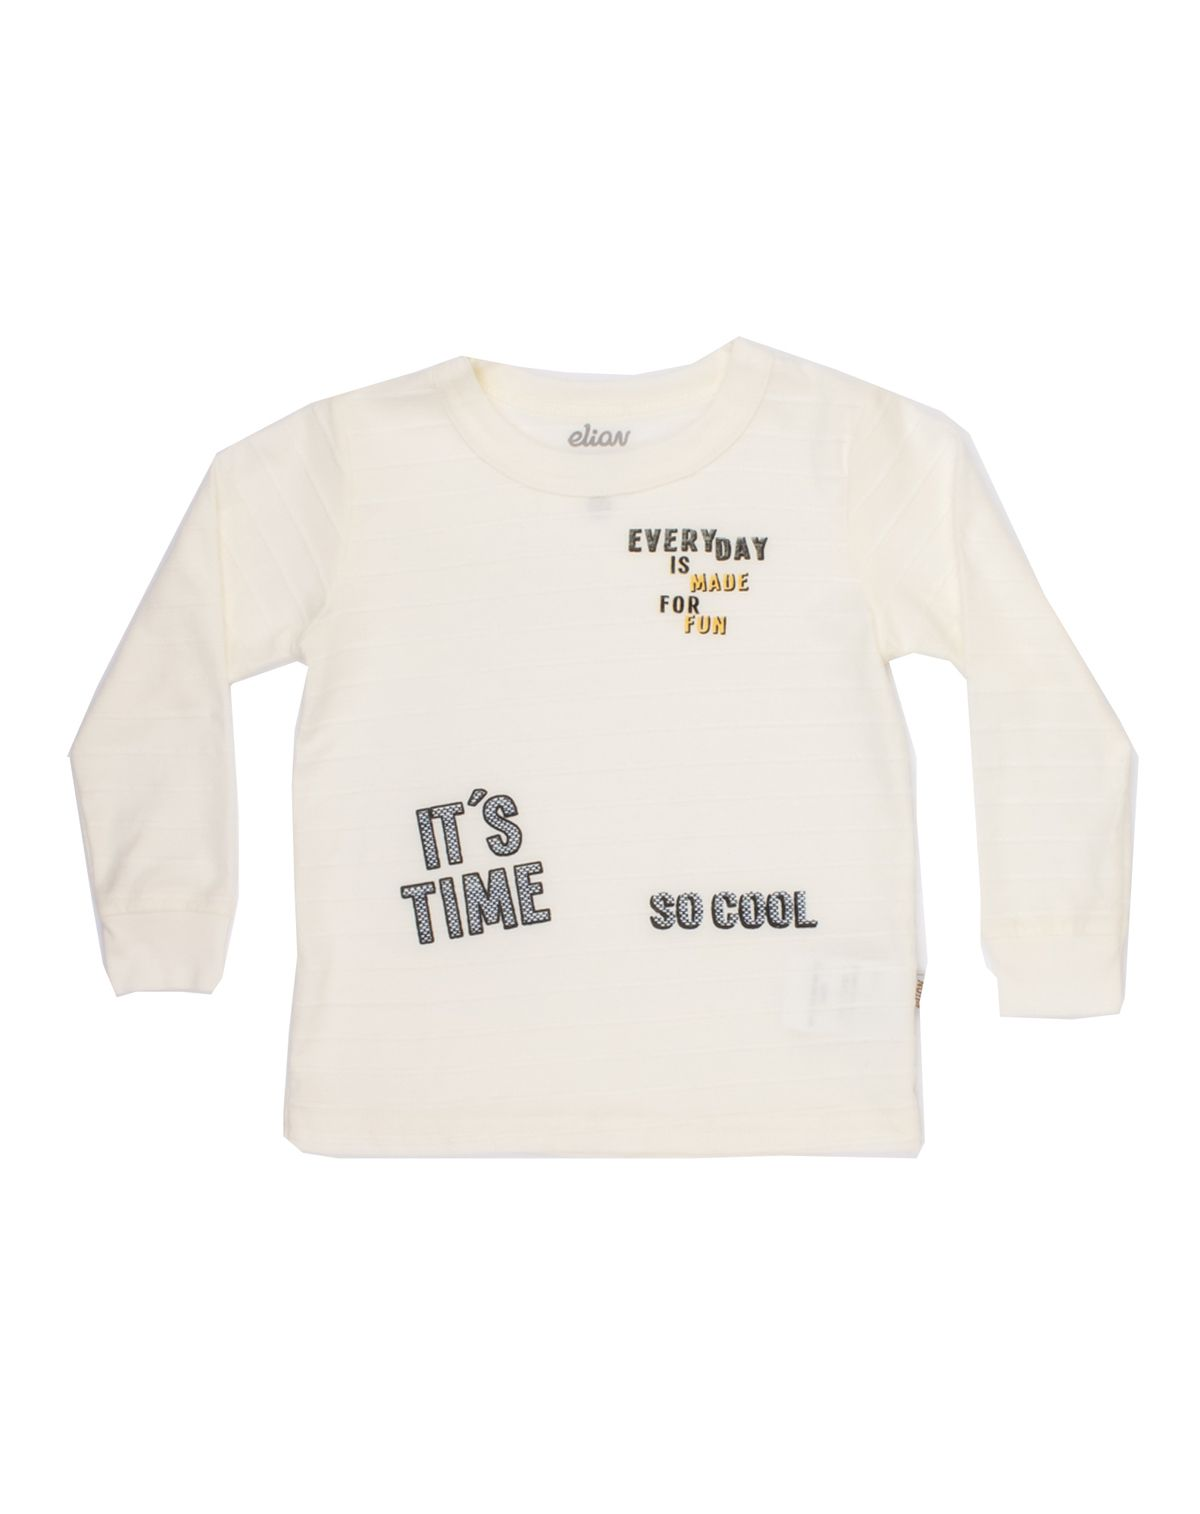 578003004-camiseta-manga-longa-bebe-menino-estampada-nervuras-off-white-1-435